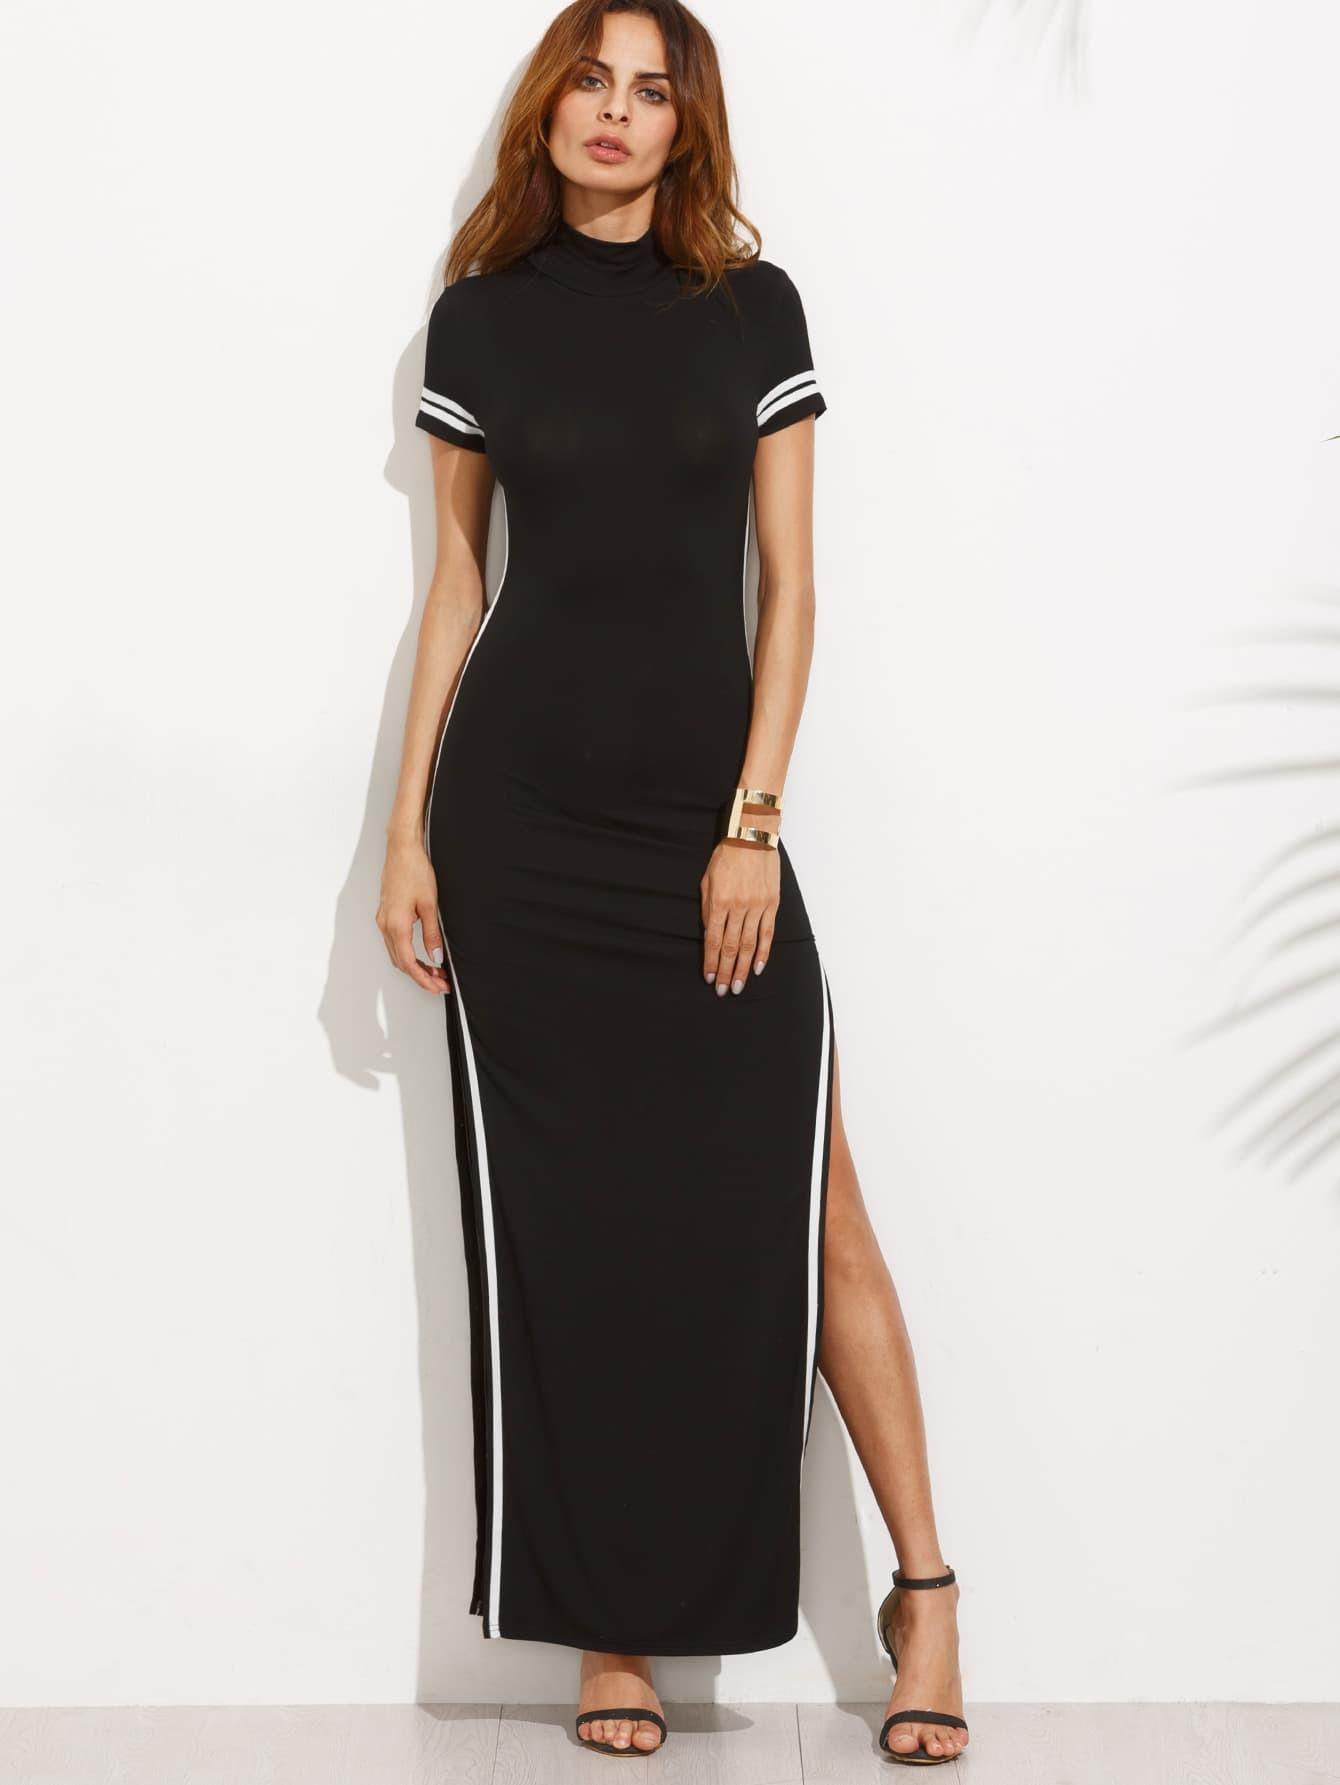 Striped Trim High Split Cutout Back Dress dress160718714